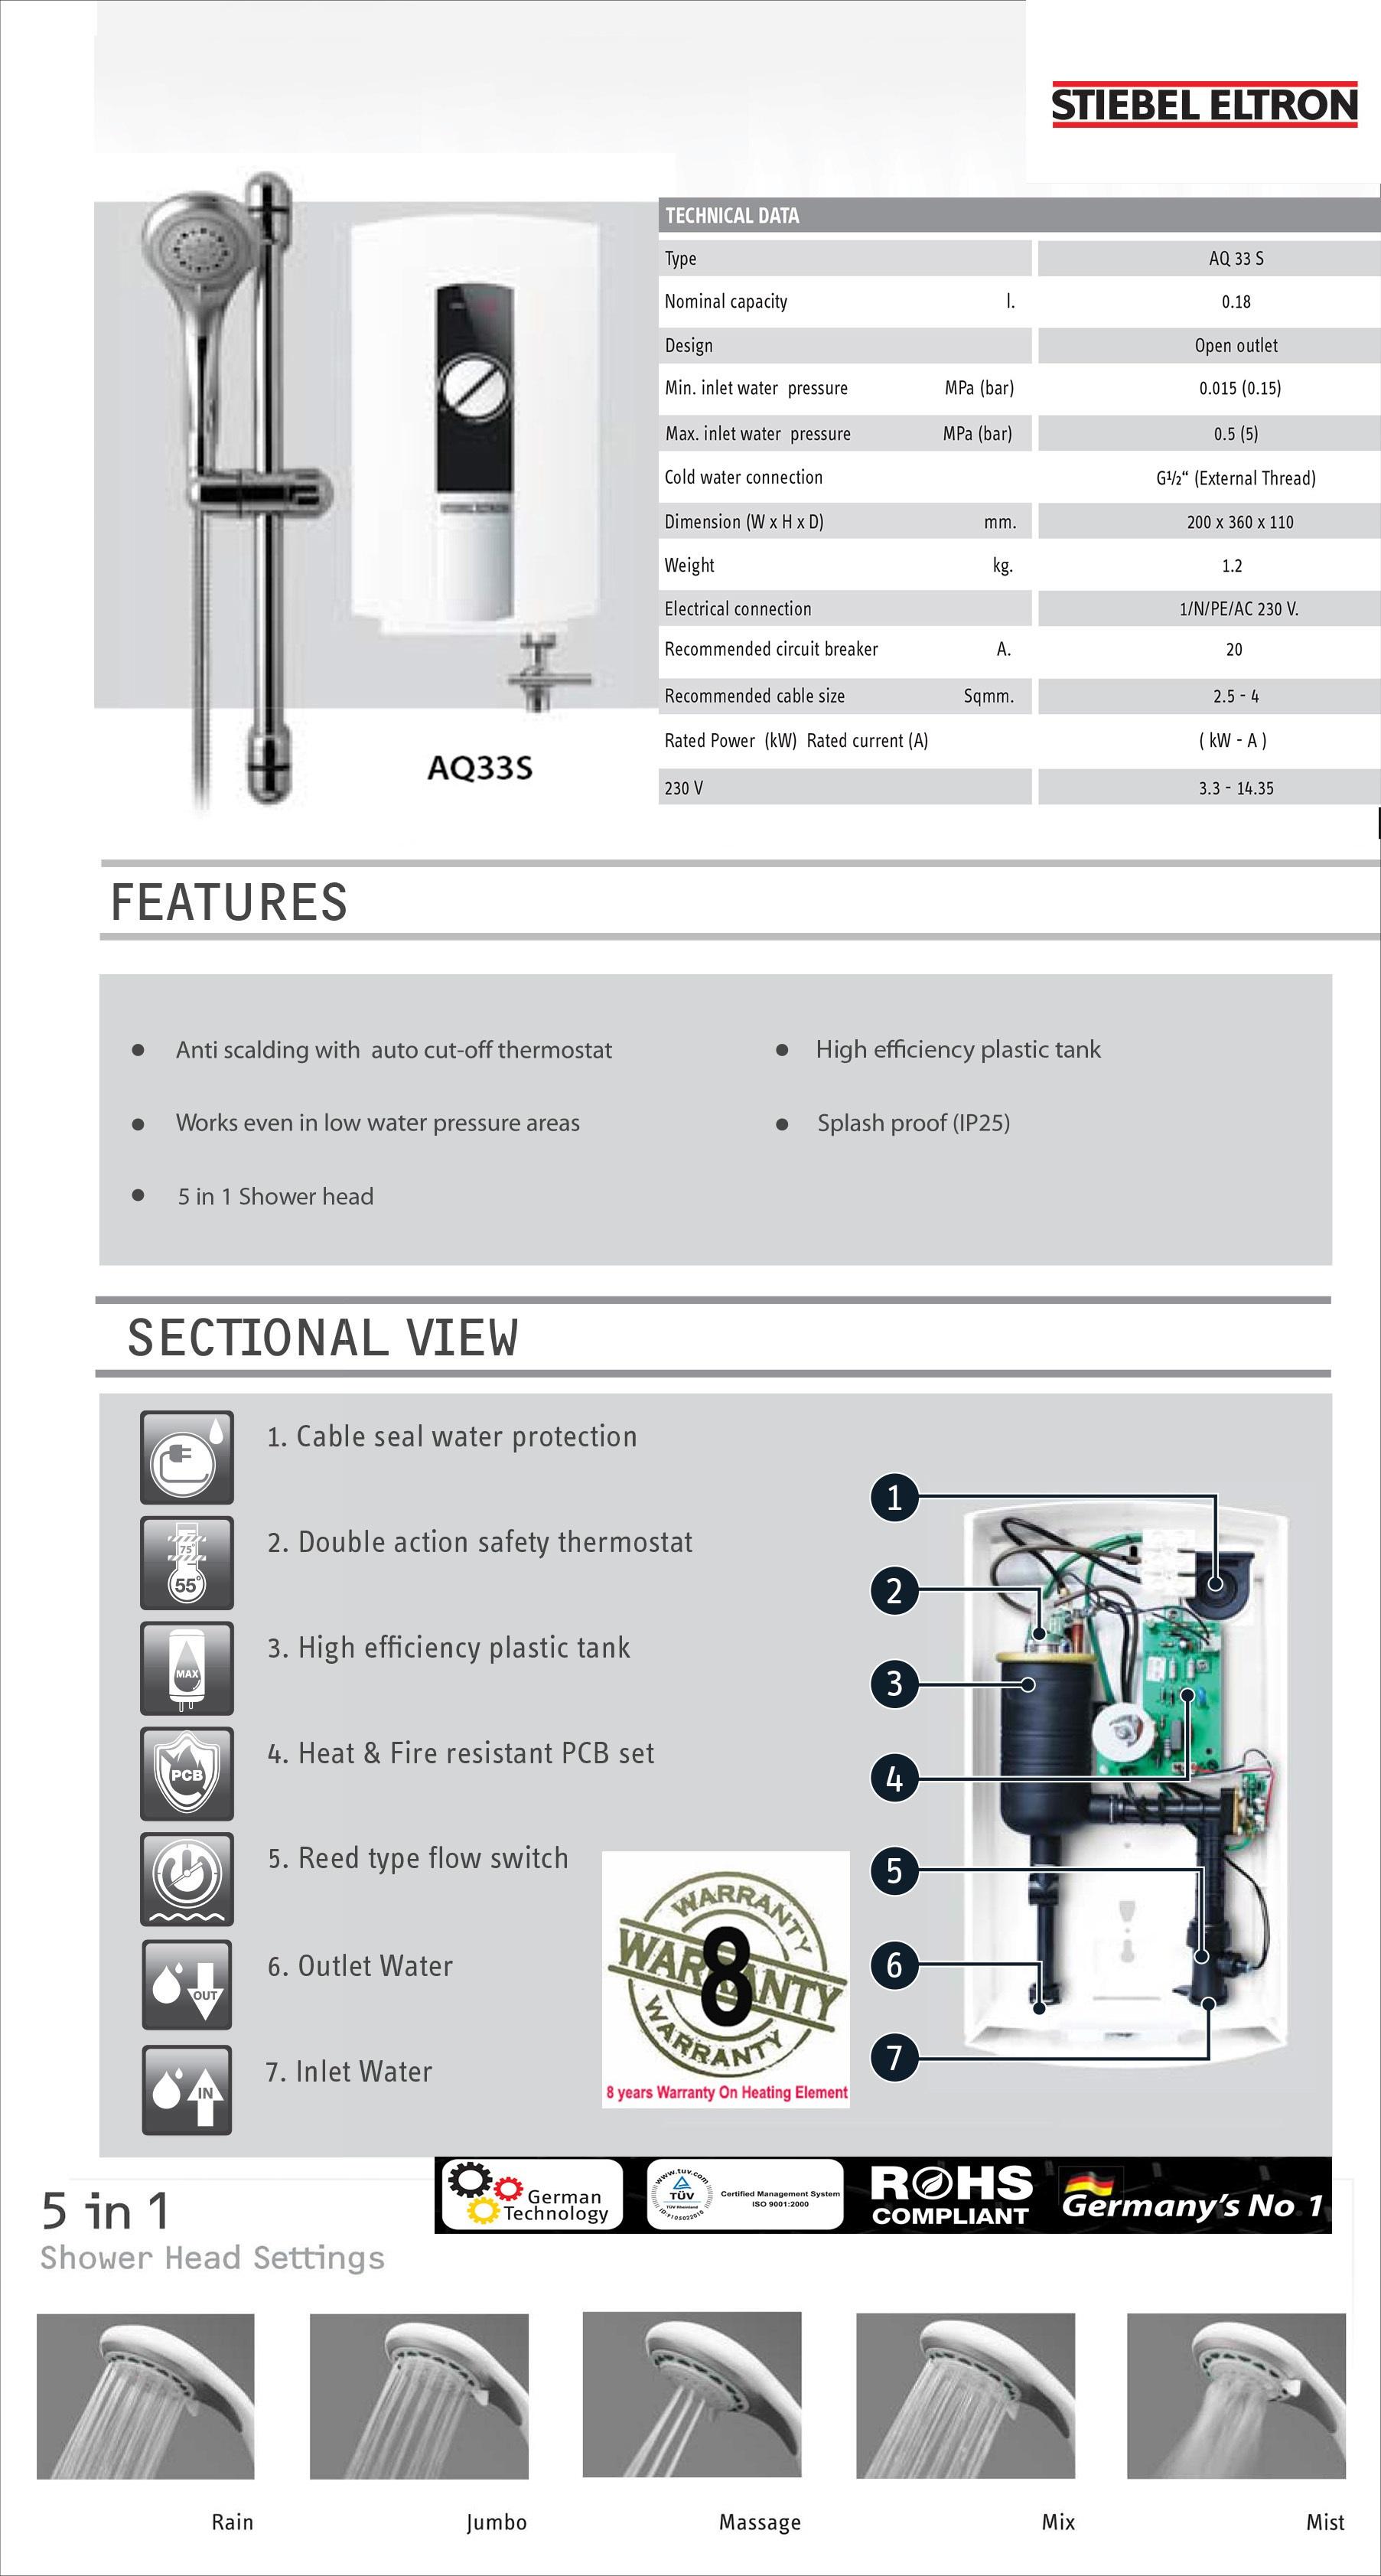 stiebel eltron aq33s instant water heater bacera. Black Bedroom Furniture Sets. Home Design Ideas